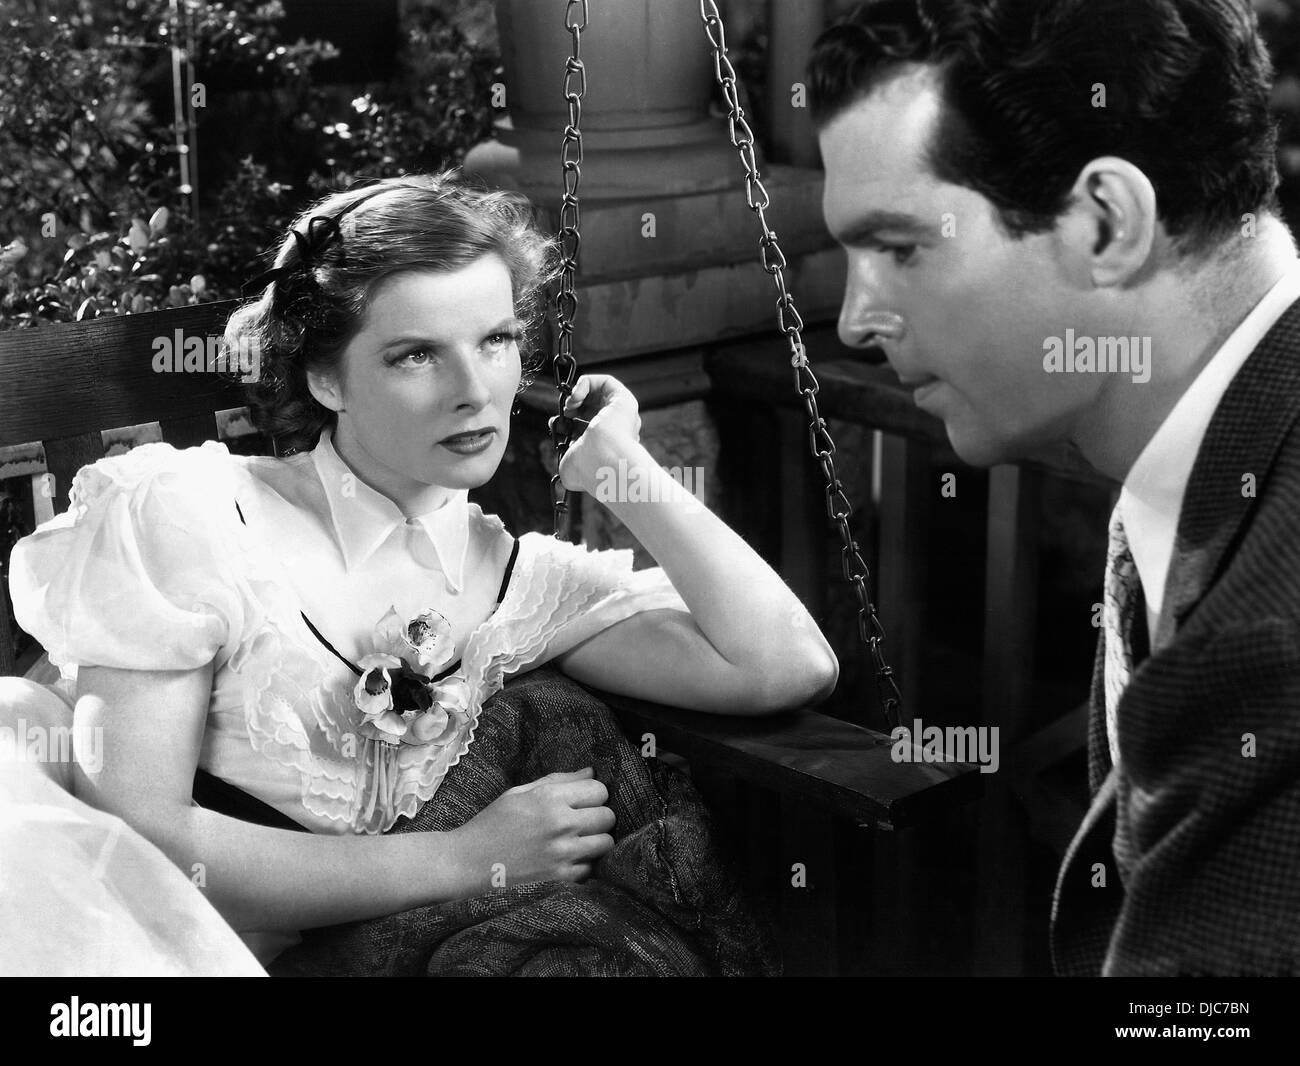 Katharine Hepburn and Fred MacMurray on-set of the Film, Alice Adams, 1935 - Stock Image